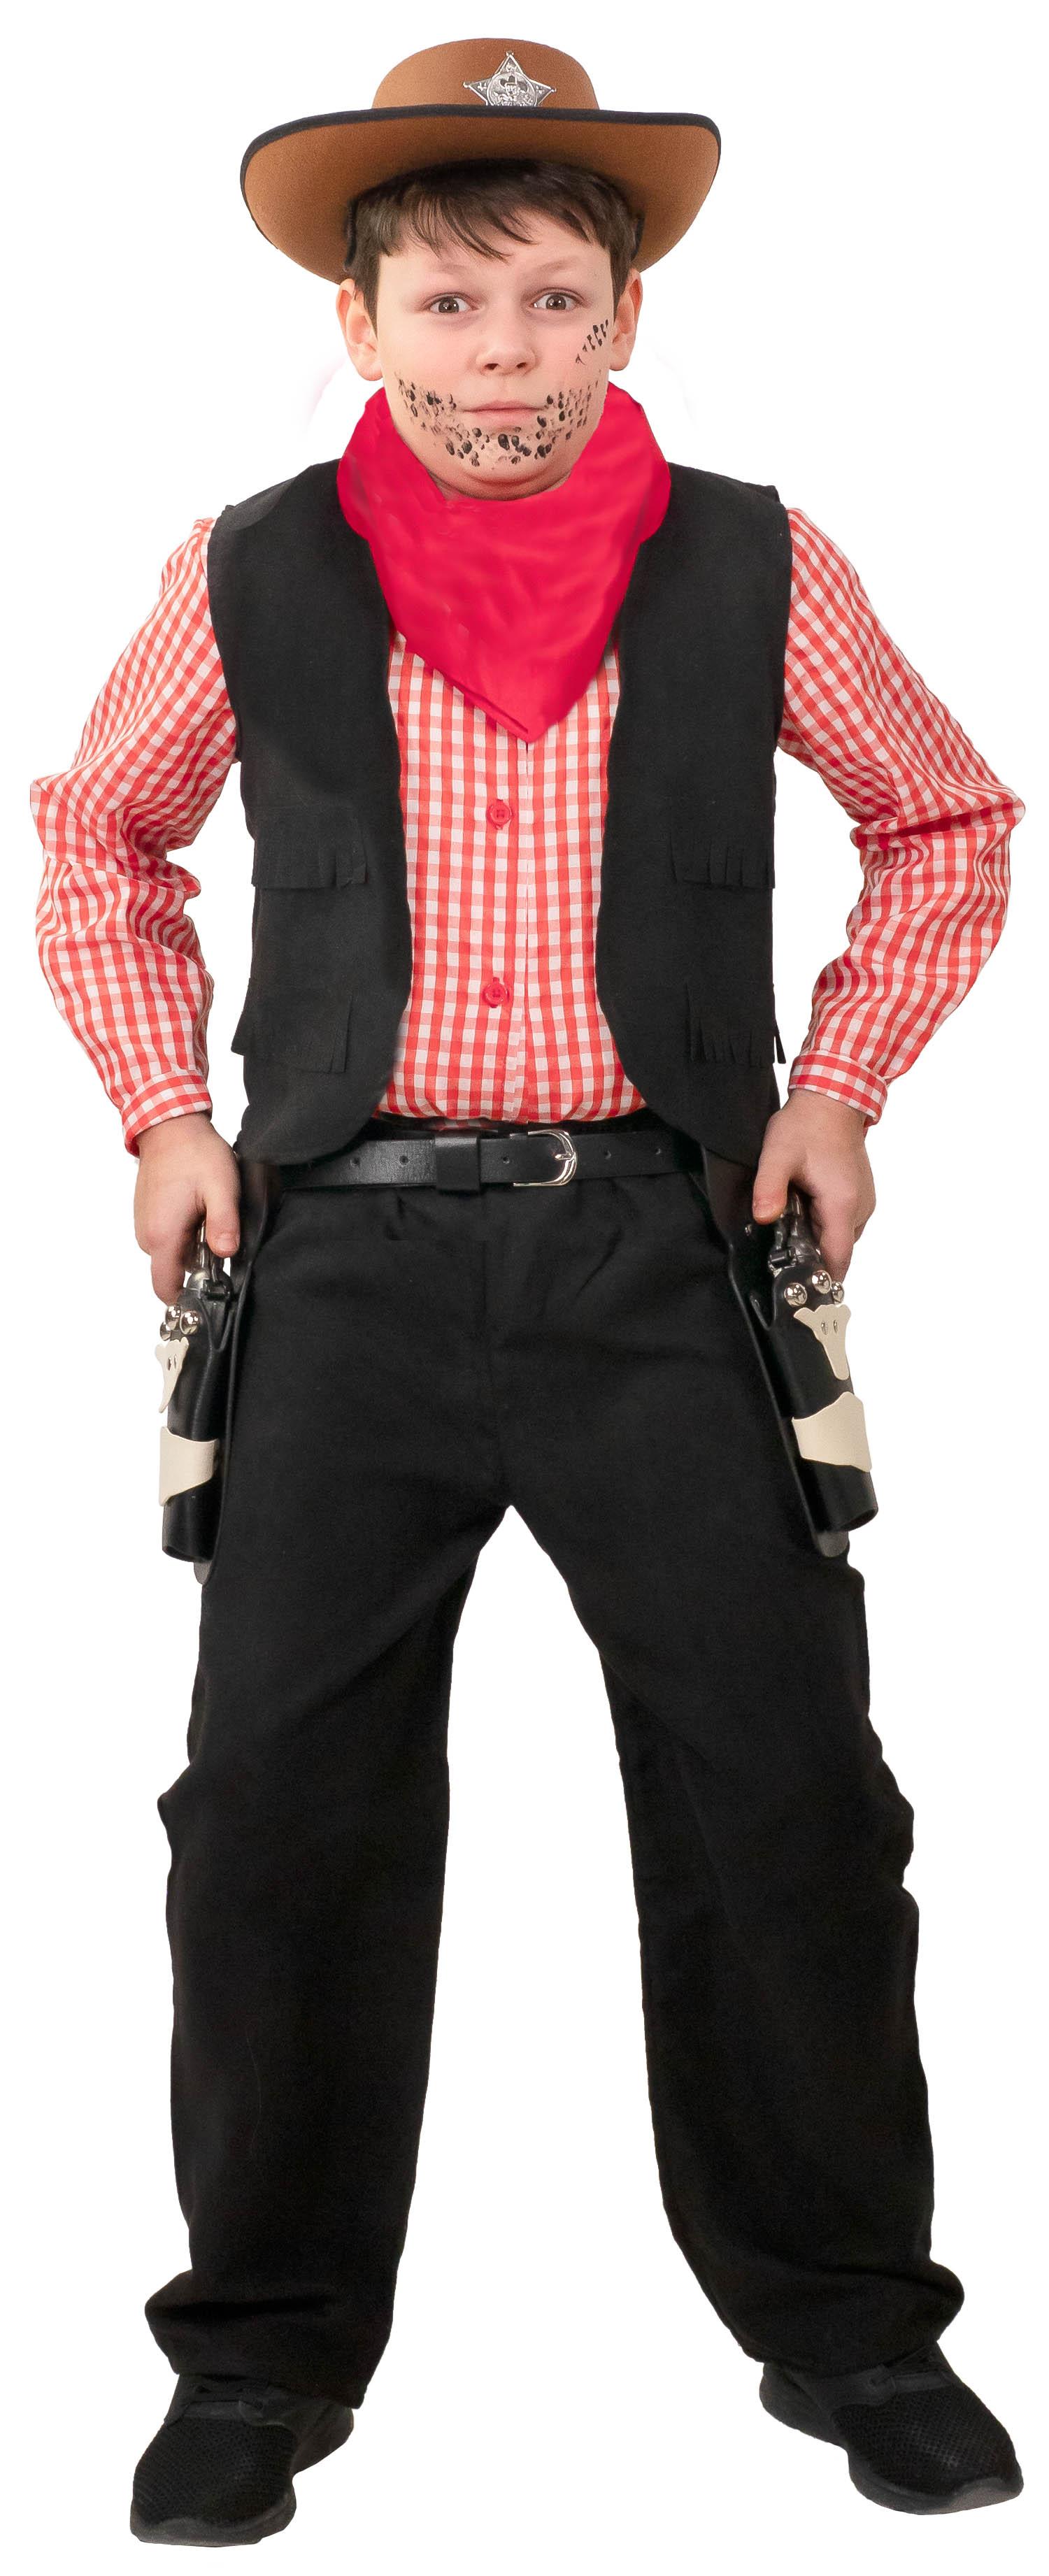 Kinderkostüm Cowboy 4-teilig, schwarz